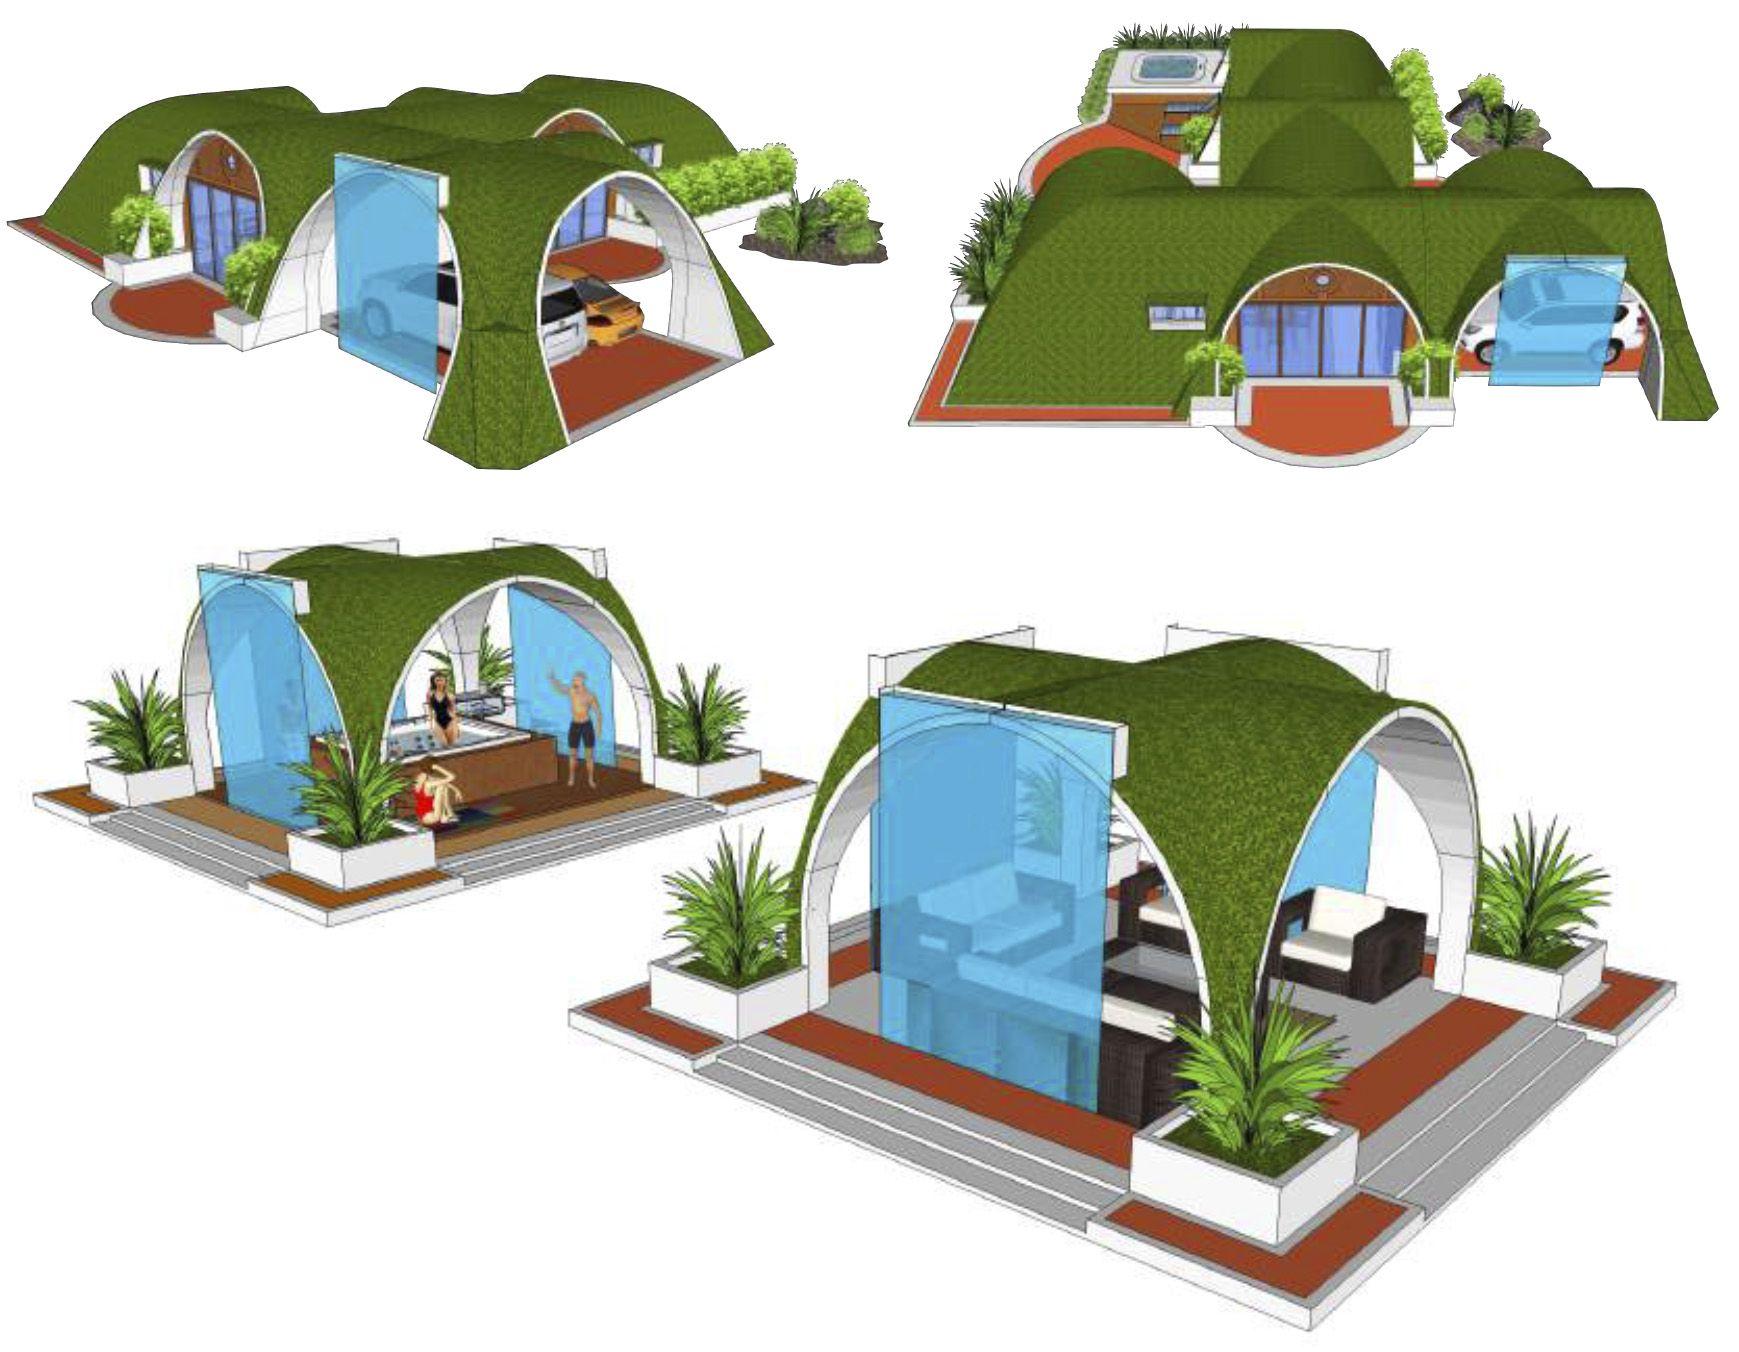 green magic homes the most beautiful green homes ever modular homes prefab new designs. Black Bedroom Furniture Sets. Home Design Ideas